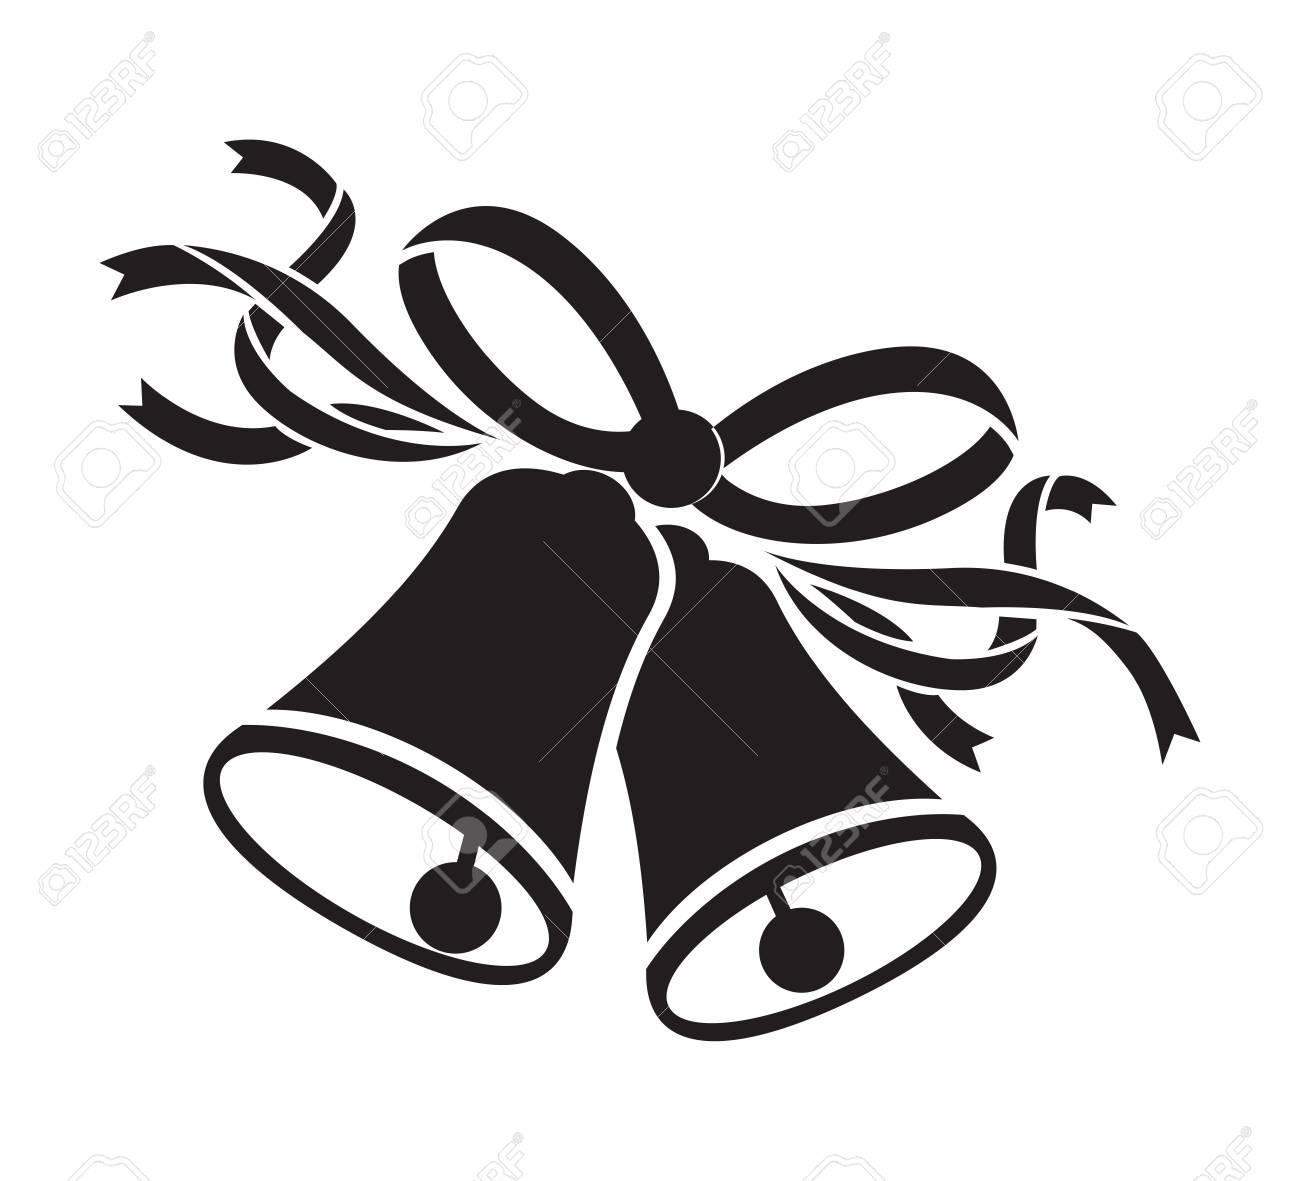 wedding black bells - 58013859